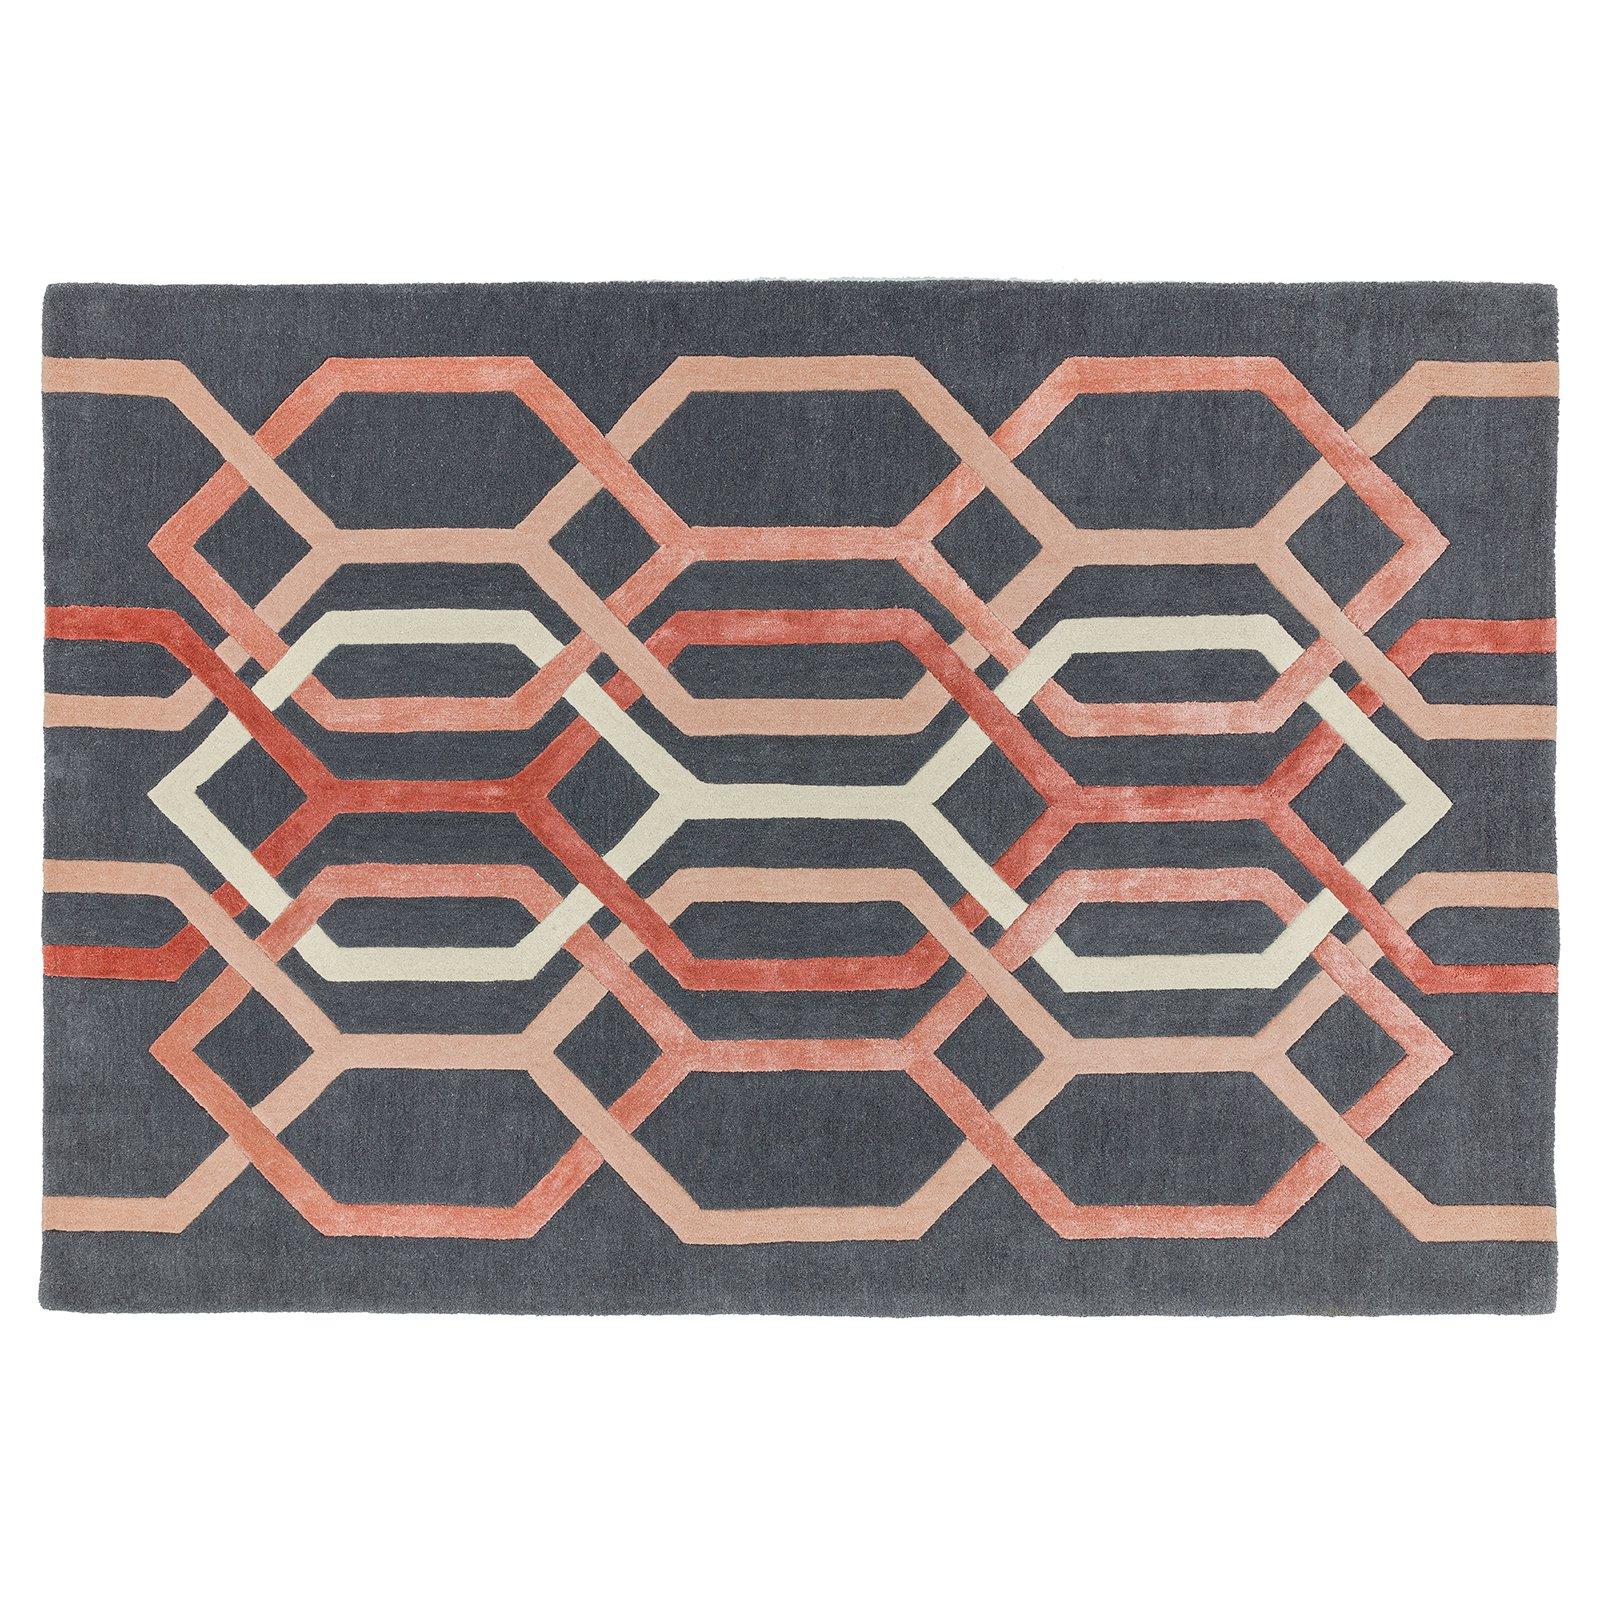 image-Geom Wool Rug, 120X170 cm, Charcoal